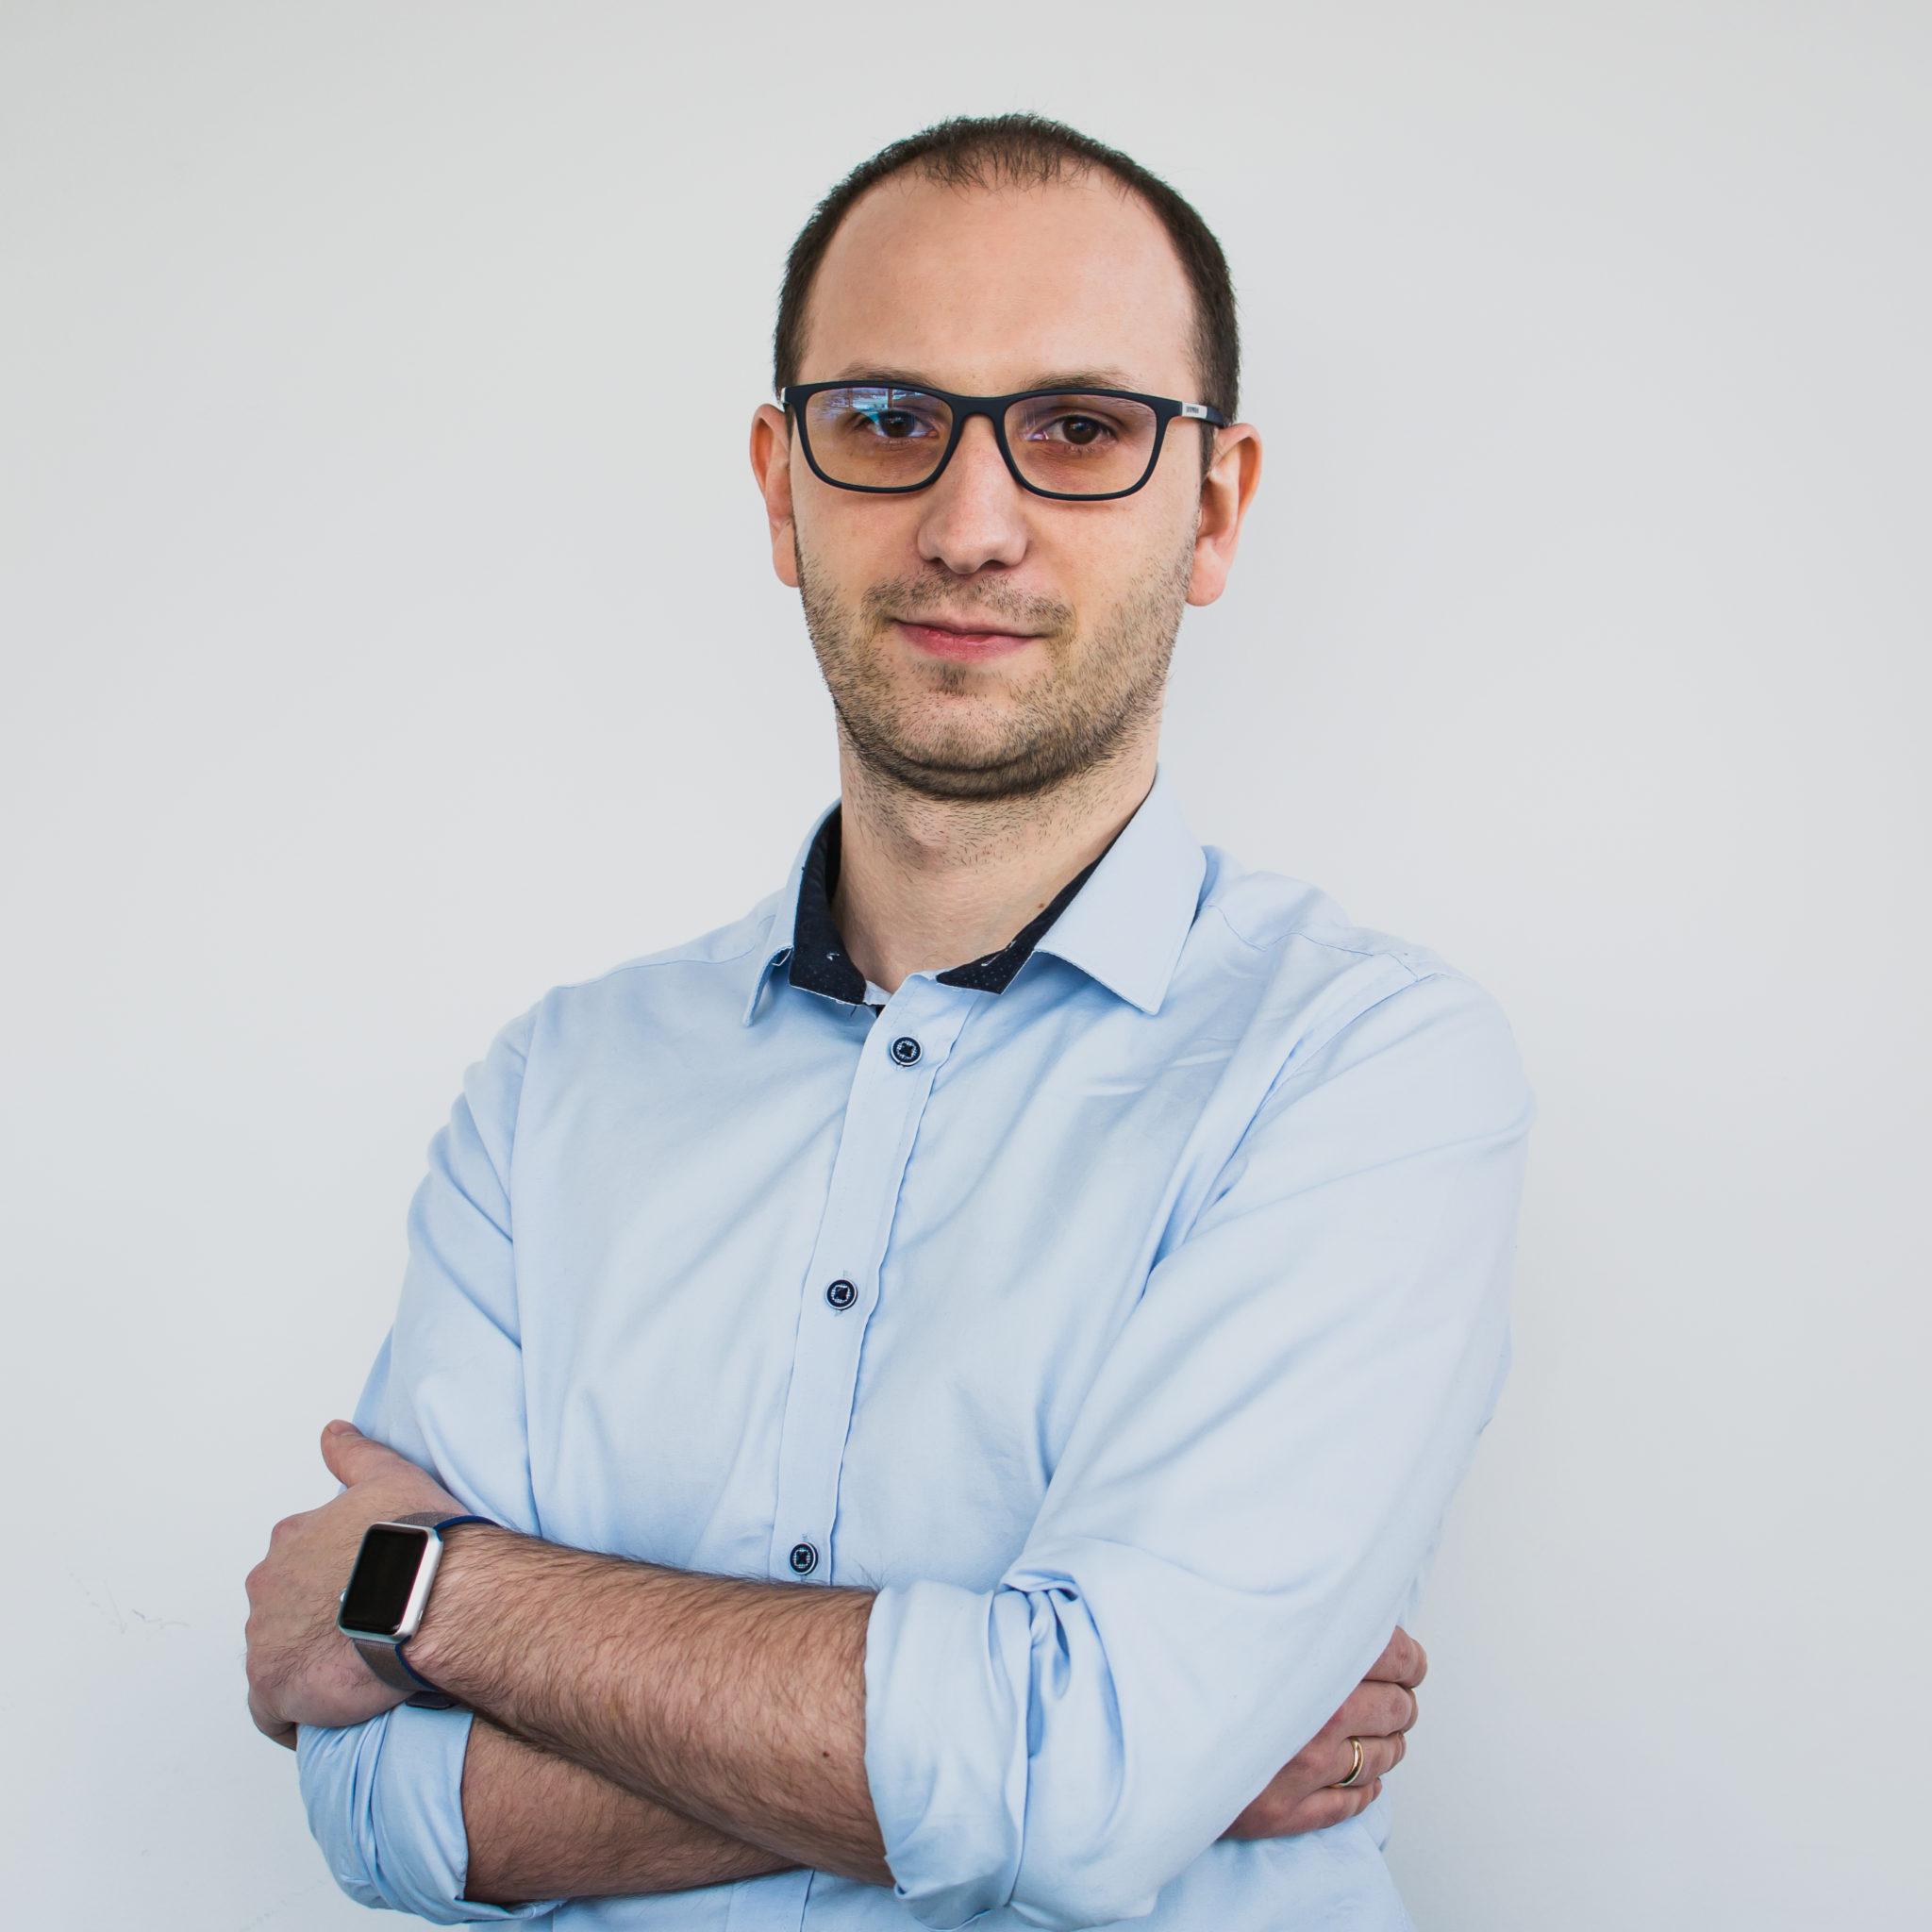 Tomek Prokop